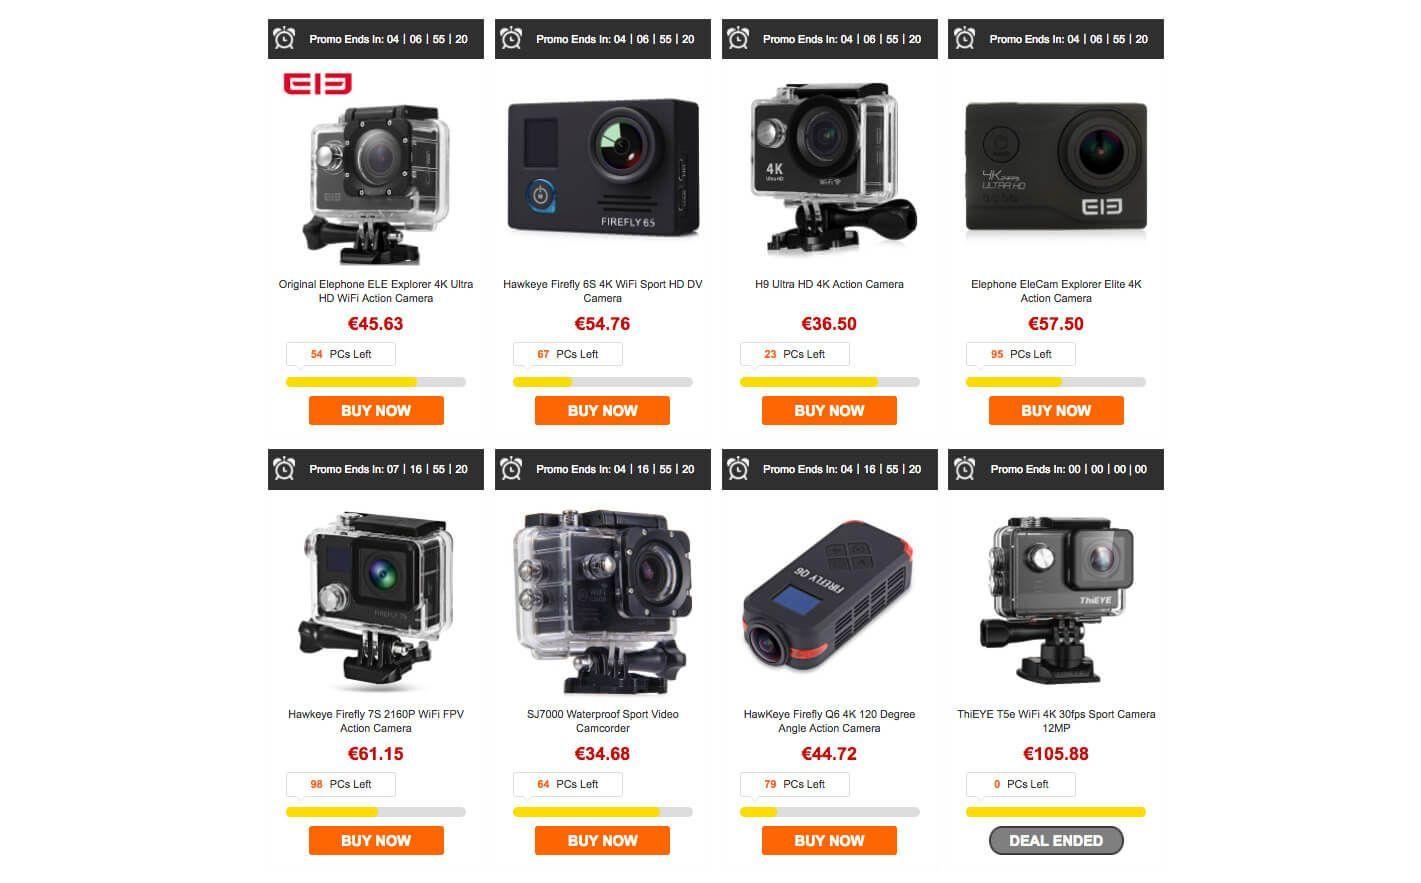 MgCool vs Elephone otras cámaras de acción